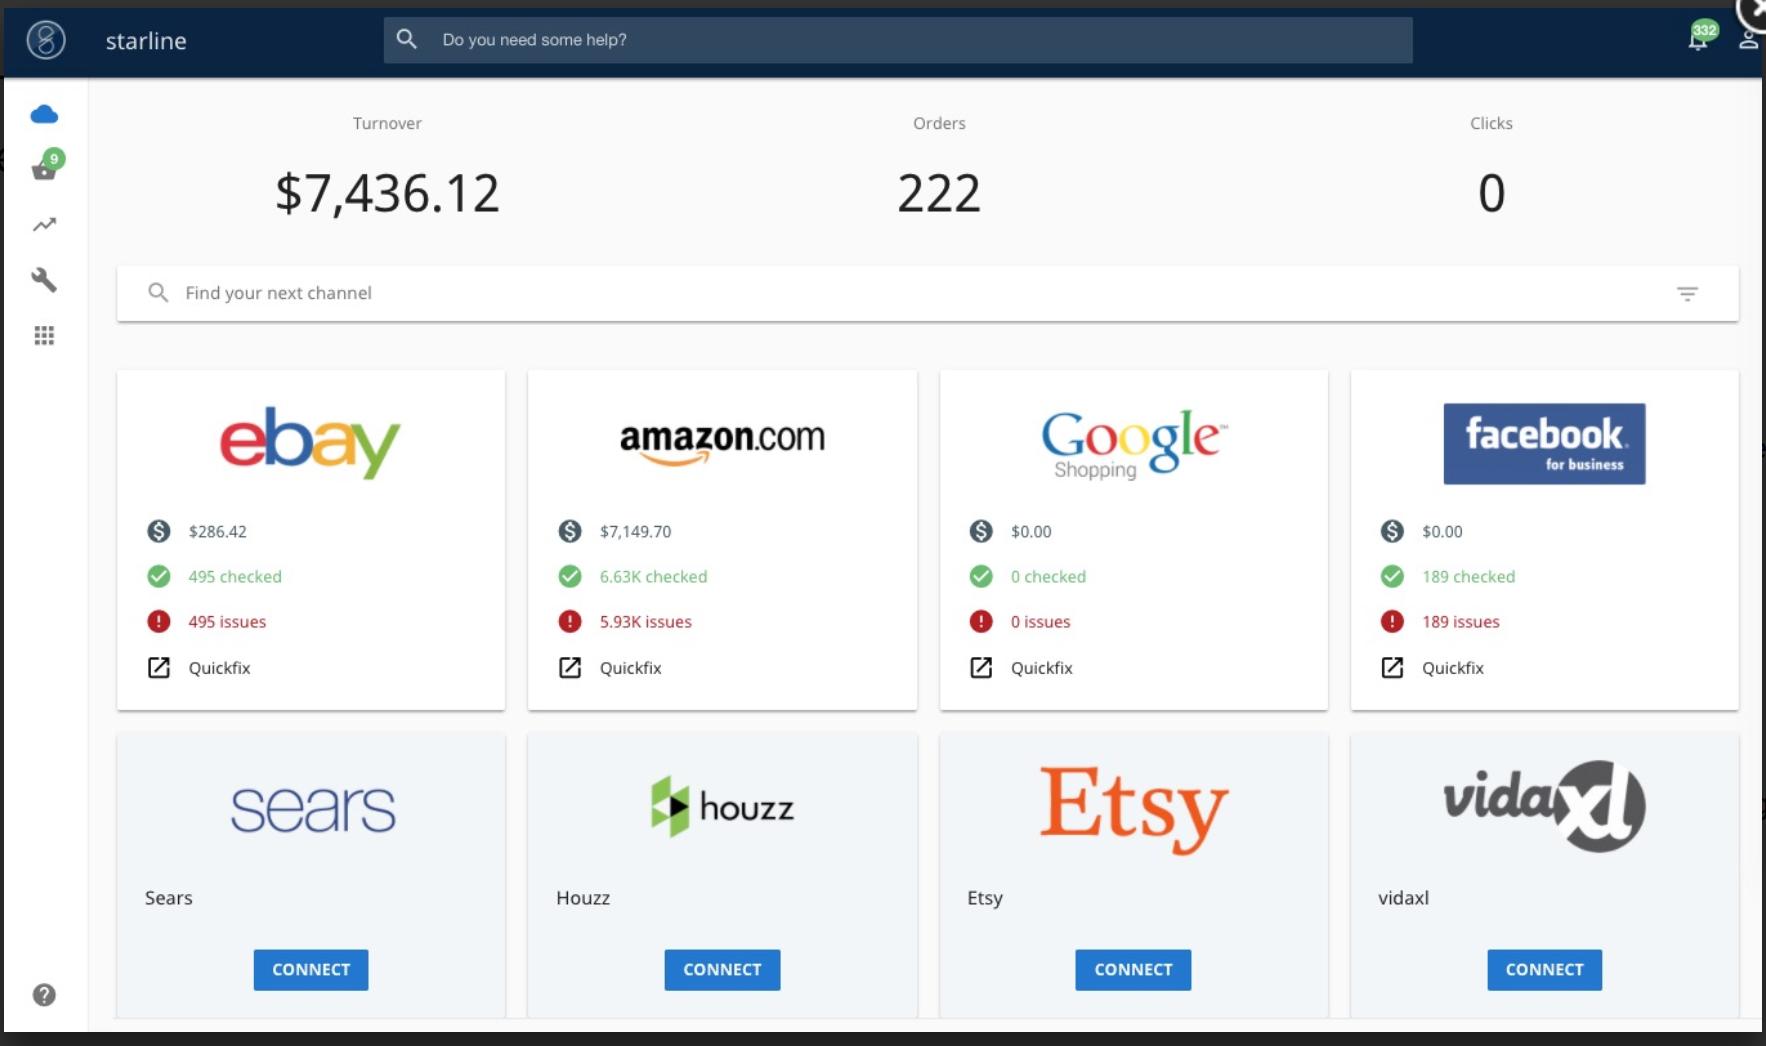 Screenshot showing the Starline dashboard